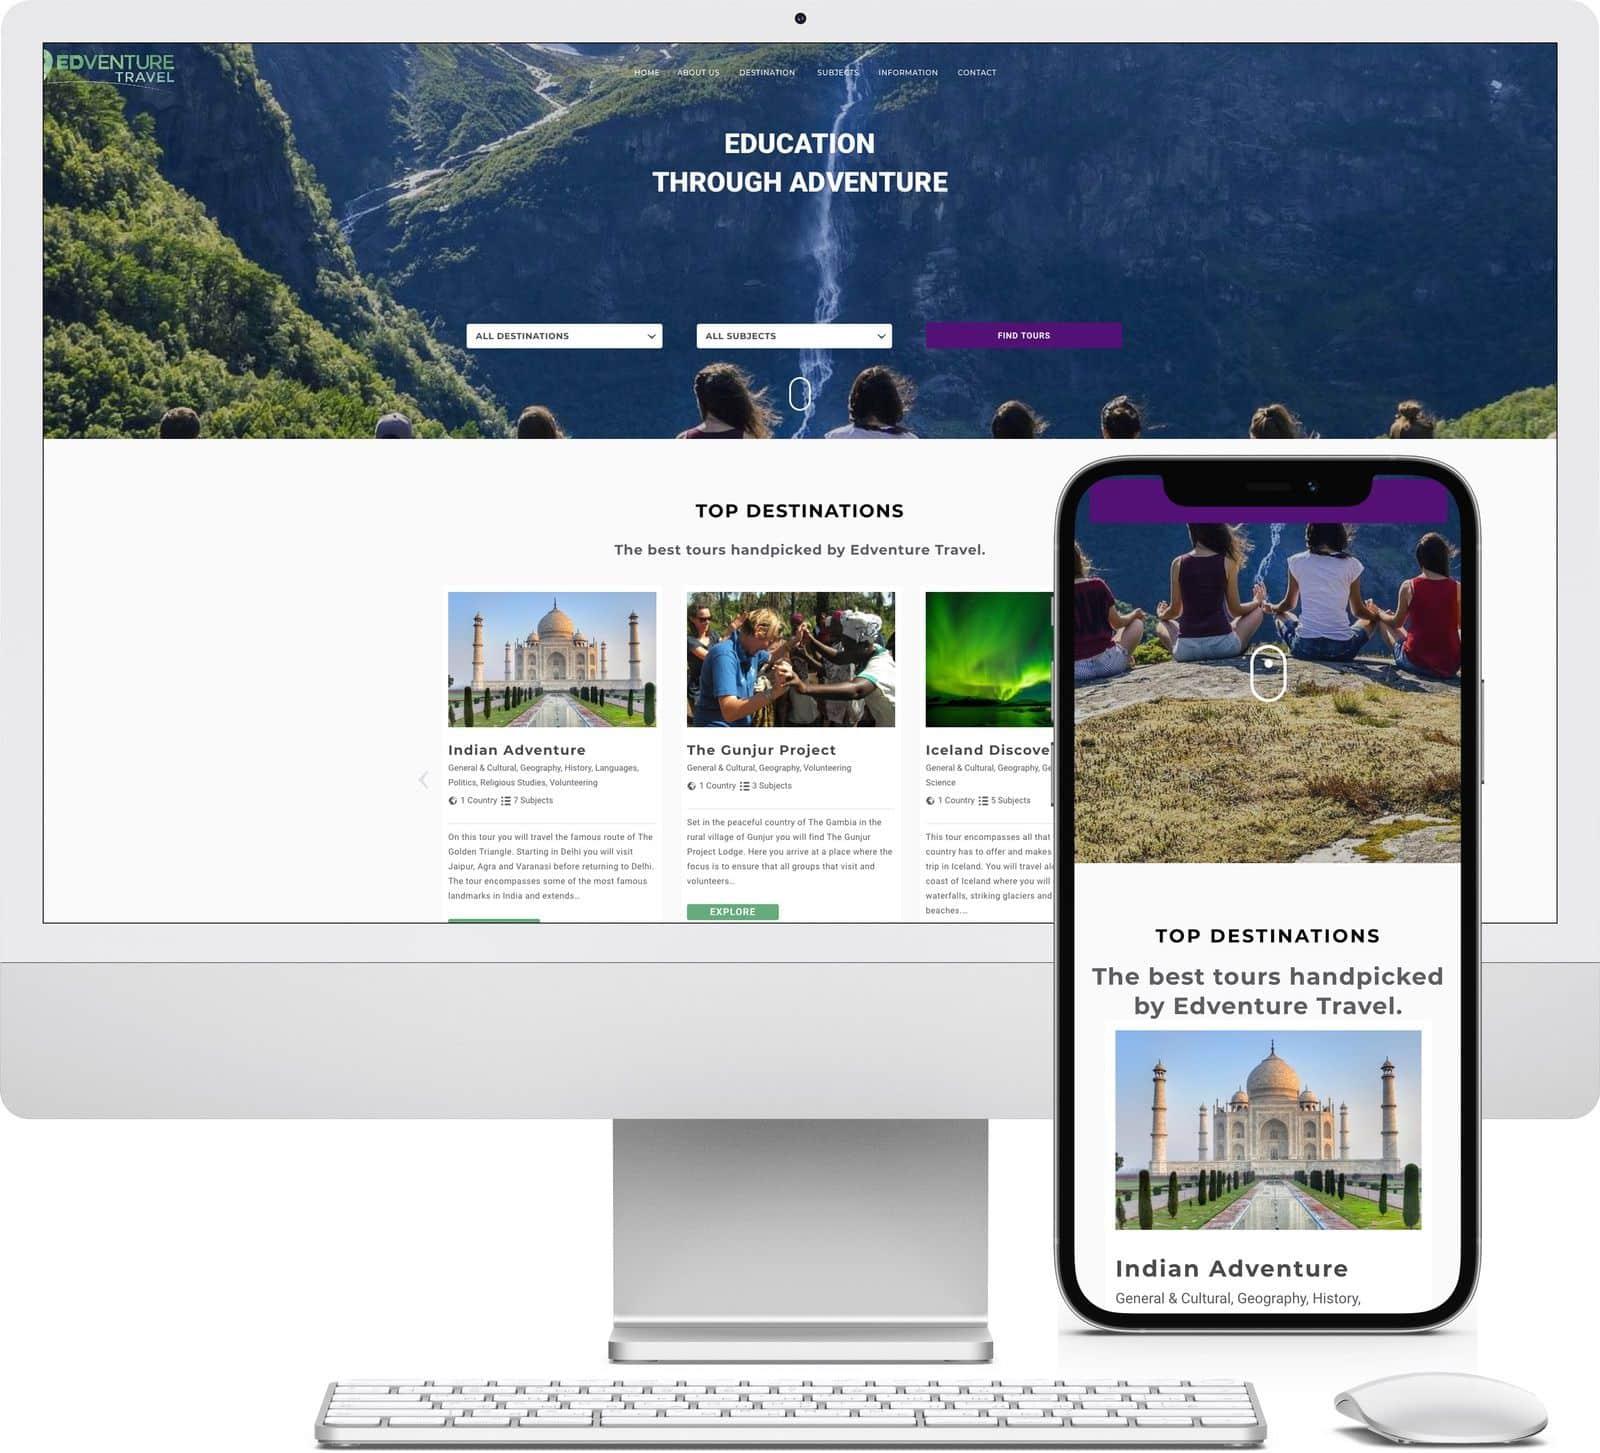 Edventure Travel iMac and iPhone mockup image - Riotspace Creative